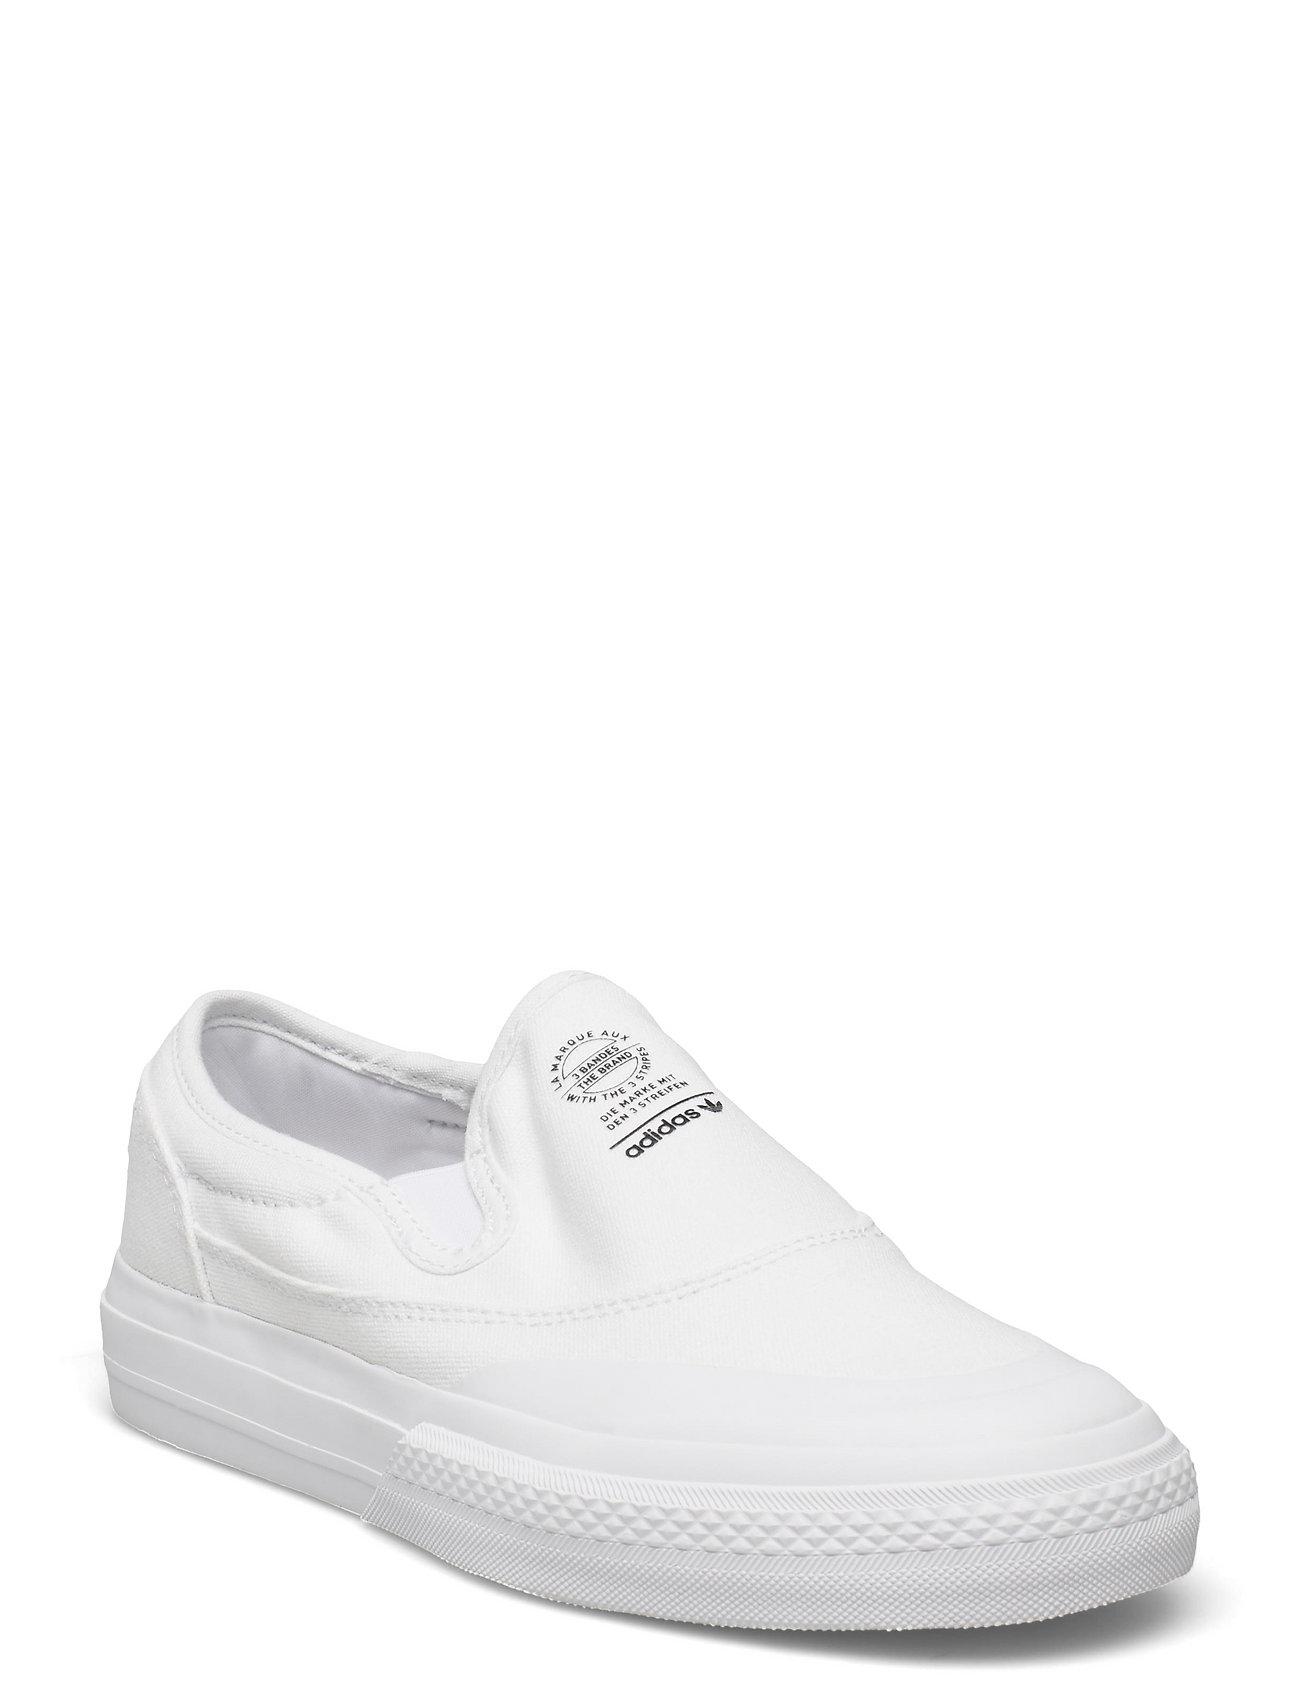 Nizza Rf Slip Sneakers Hvid Adidas Originals